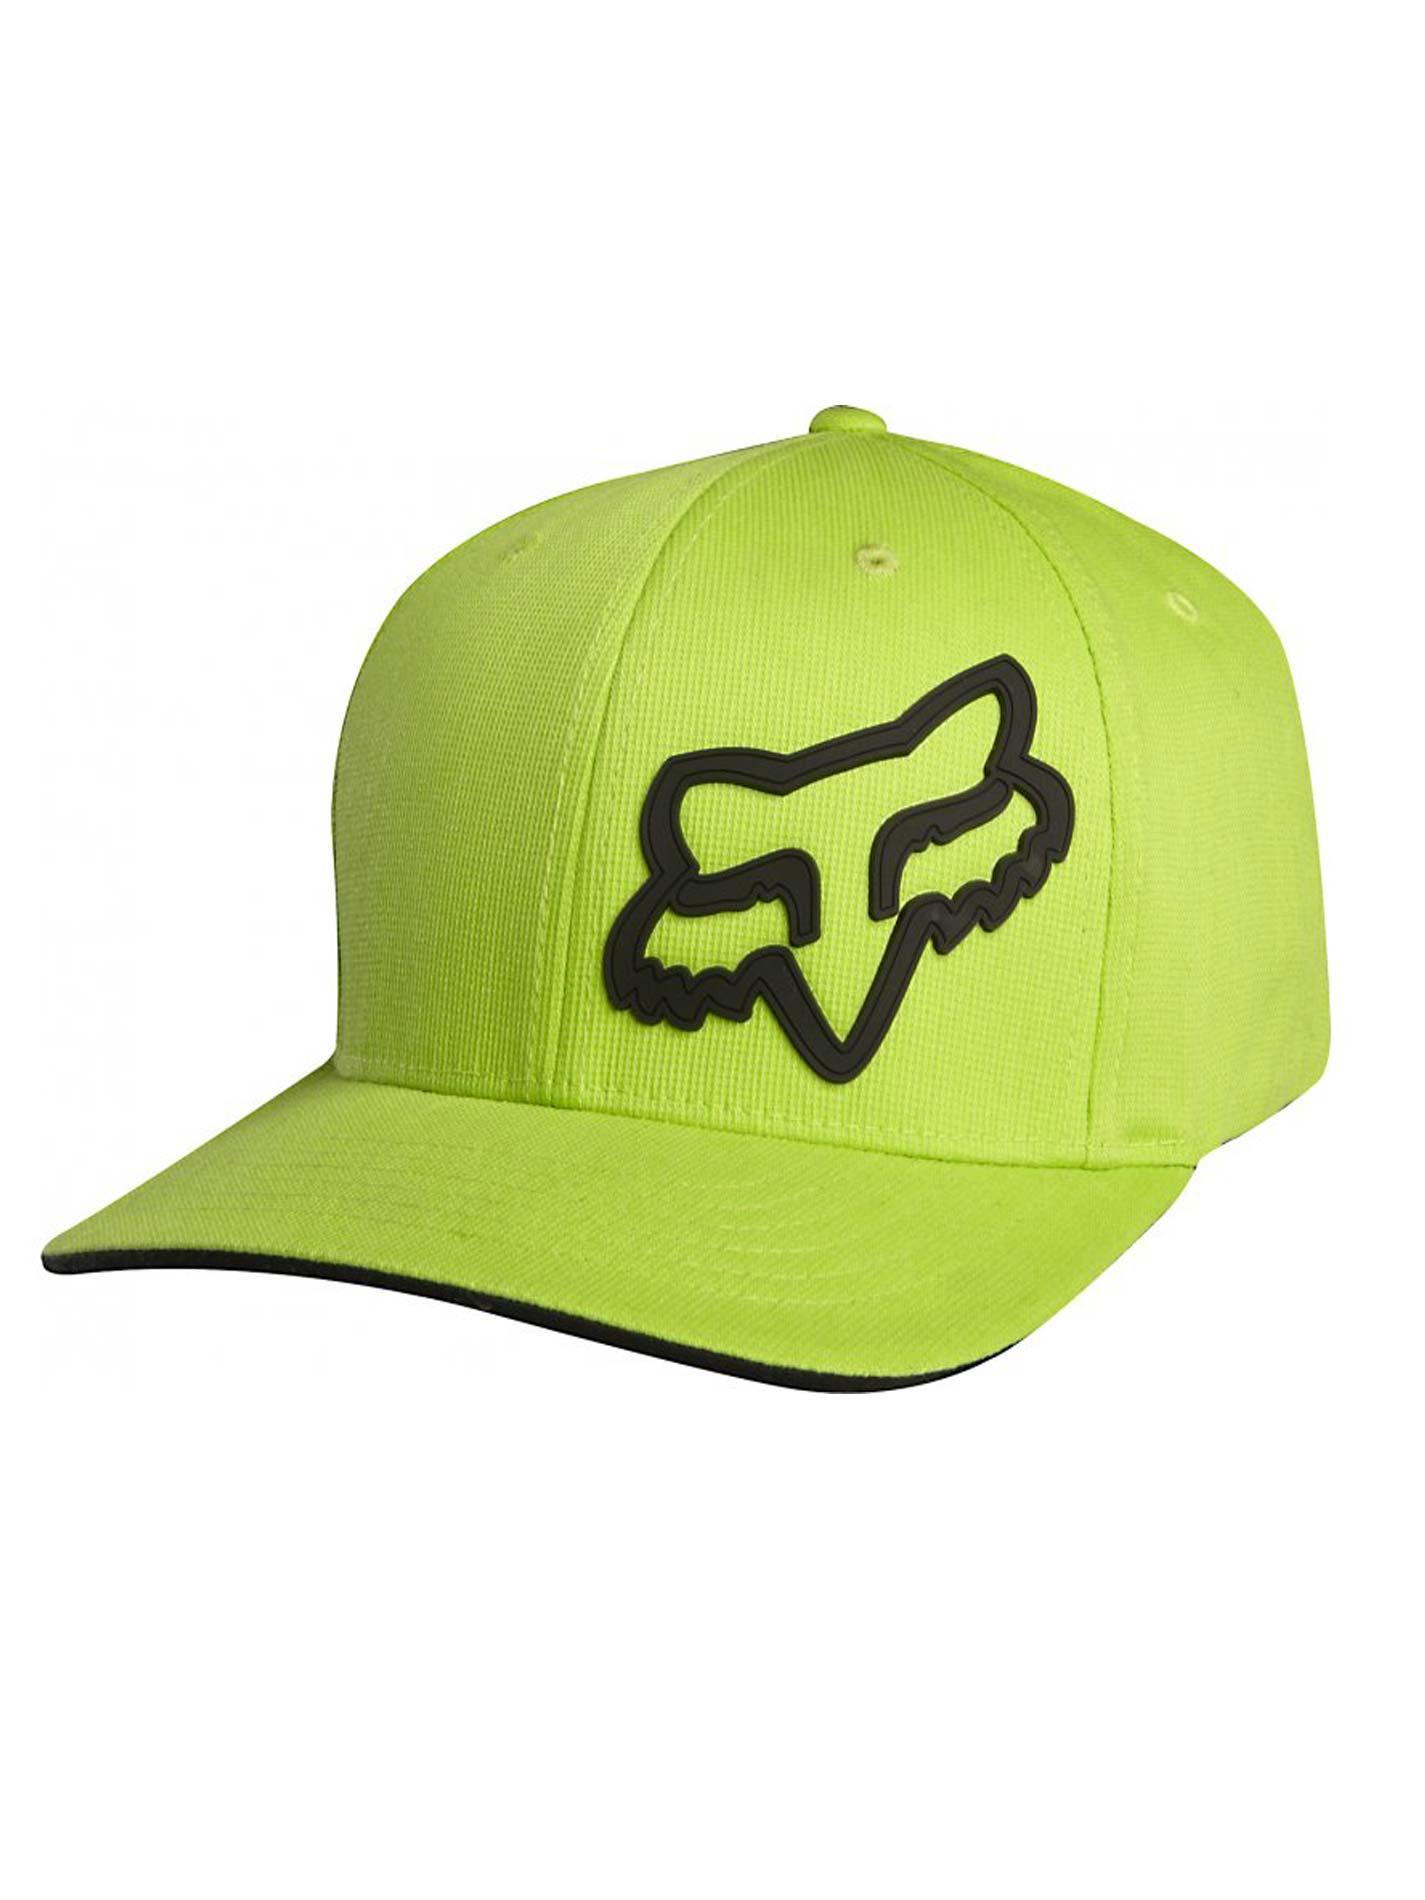 9d7f446d26e16 68138-004 BOYS SIGNATURE FLEXFIT HAT